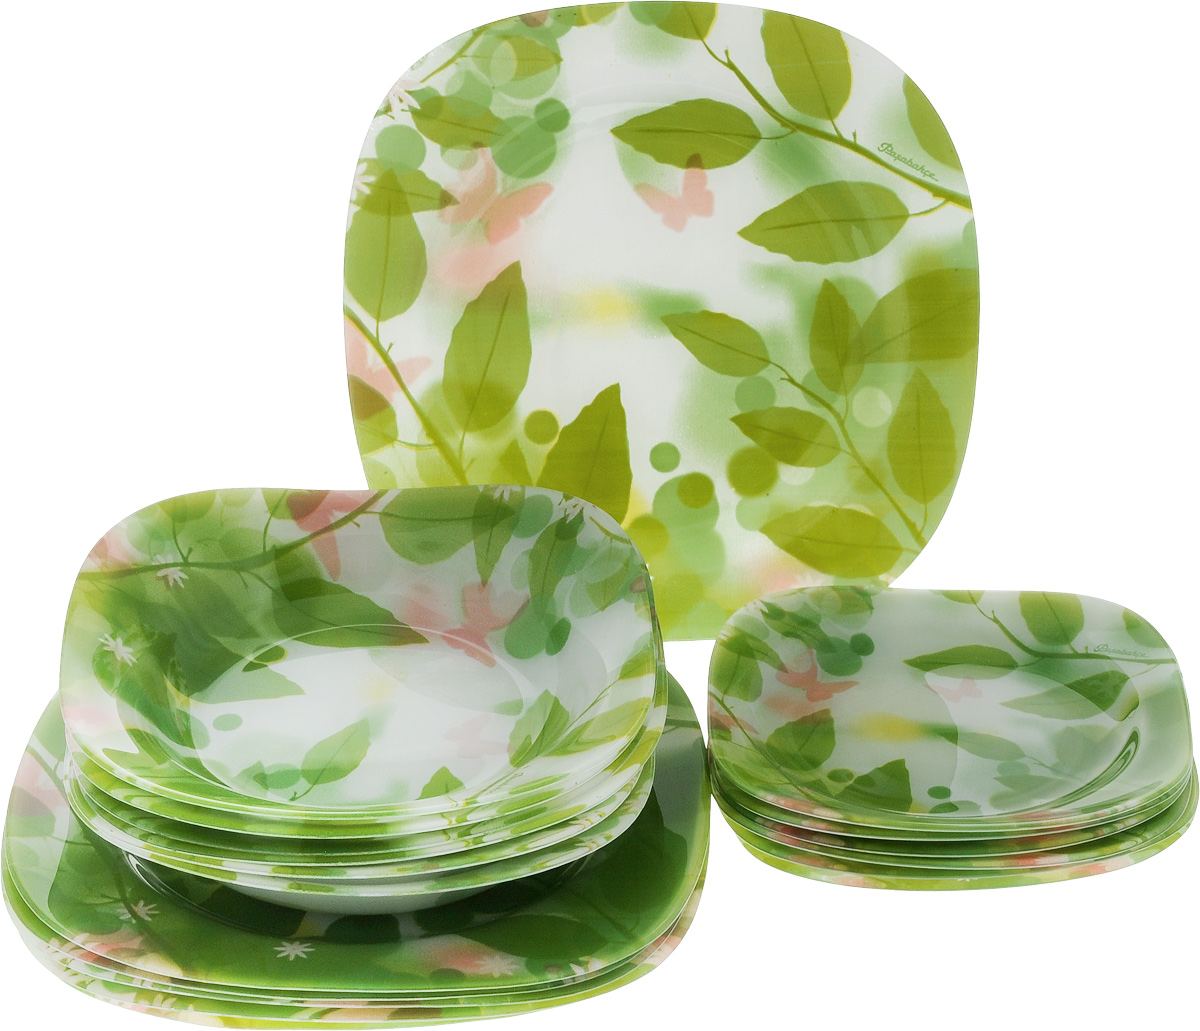 Набор тарелок Pasabahce Butterflies, 18 шт набор сундучков roura decoracion 26 х 20 х 15 см 2 шт 34791